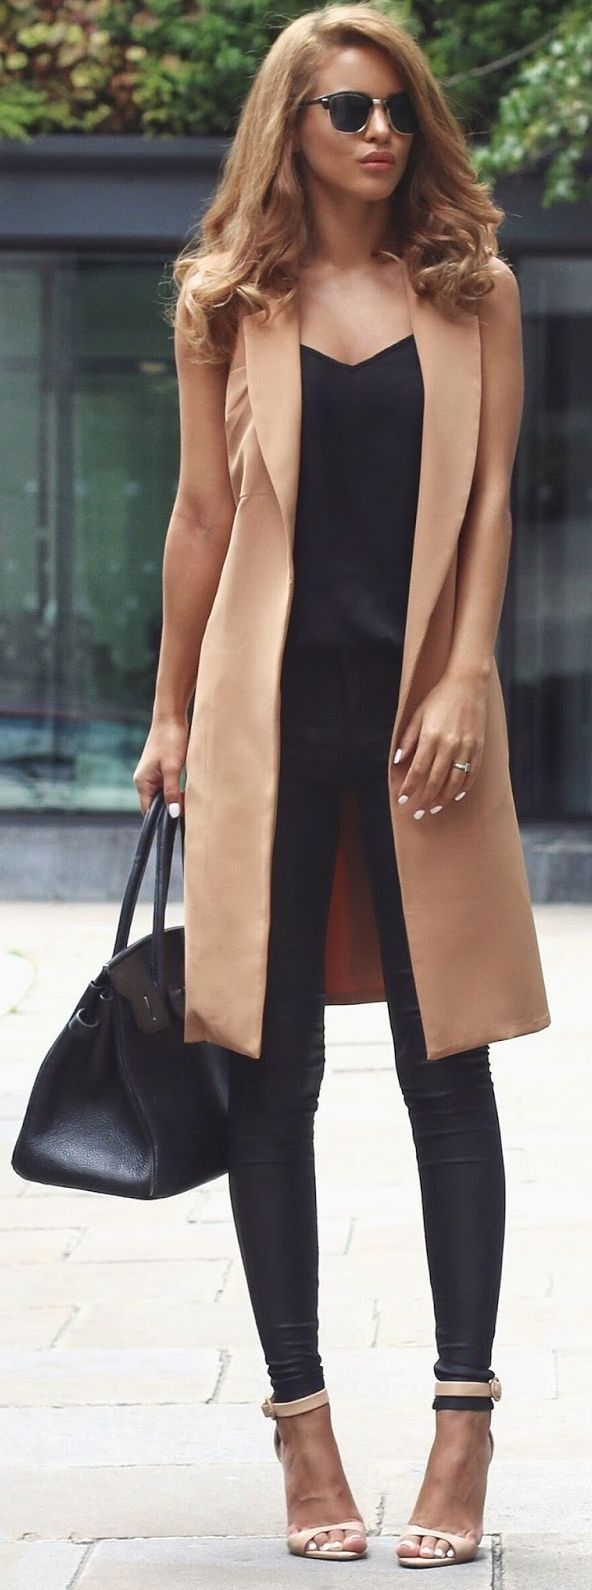 Smart Casual: - Long Vest - Black Top - Black Skinny Jeans - Strap Heels #CasualChicFashion